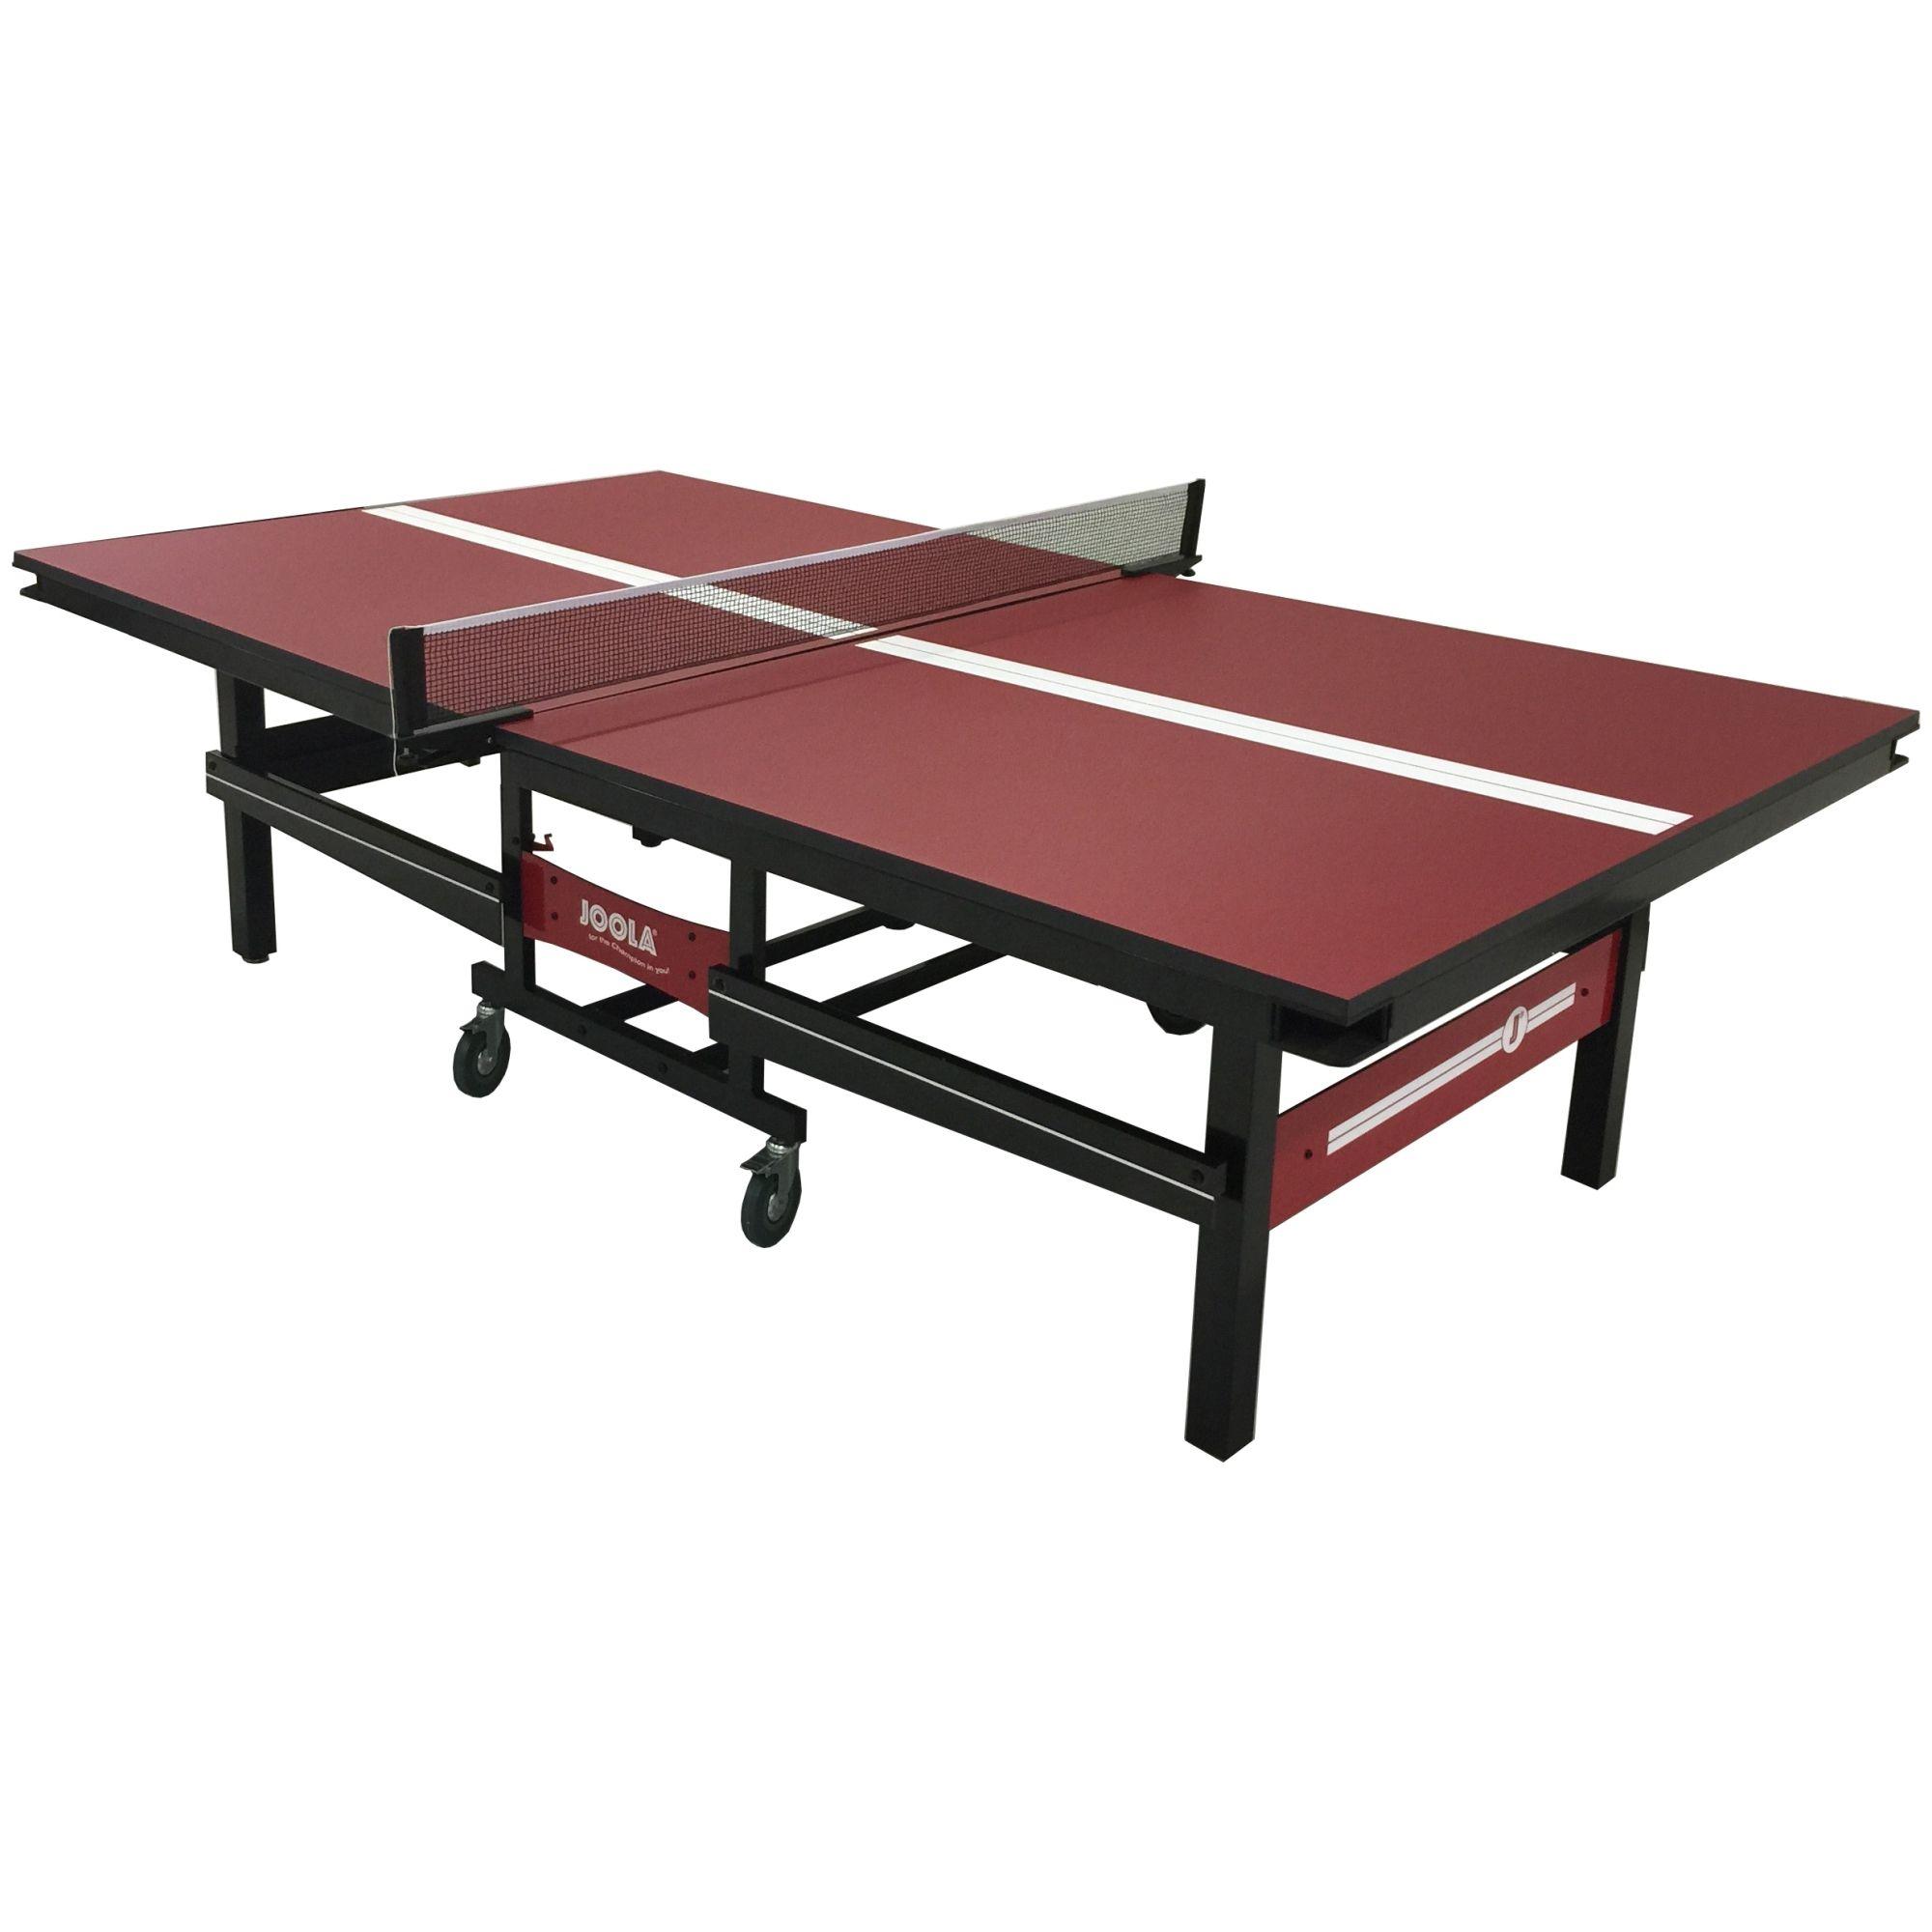 Smash A Point Down The Line On The Joola Signature 2 Piece Table Tennis Table Table Tennis Table Game Room Decor